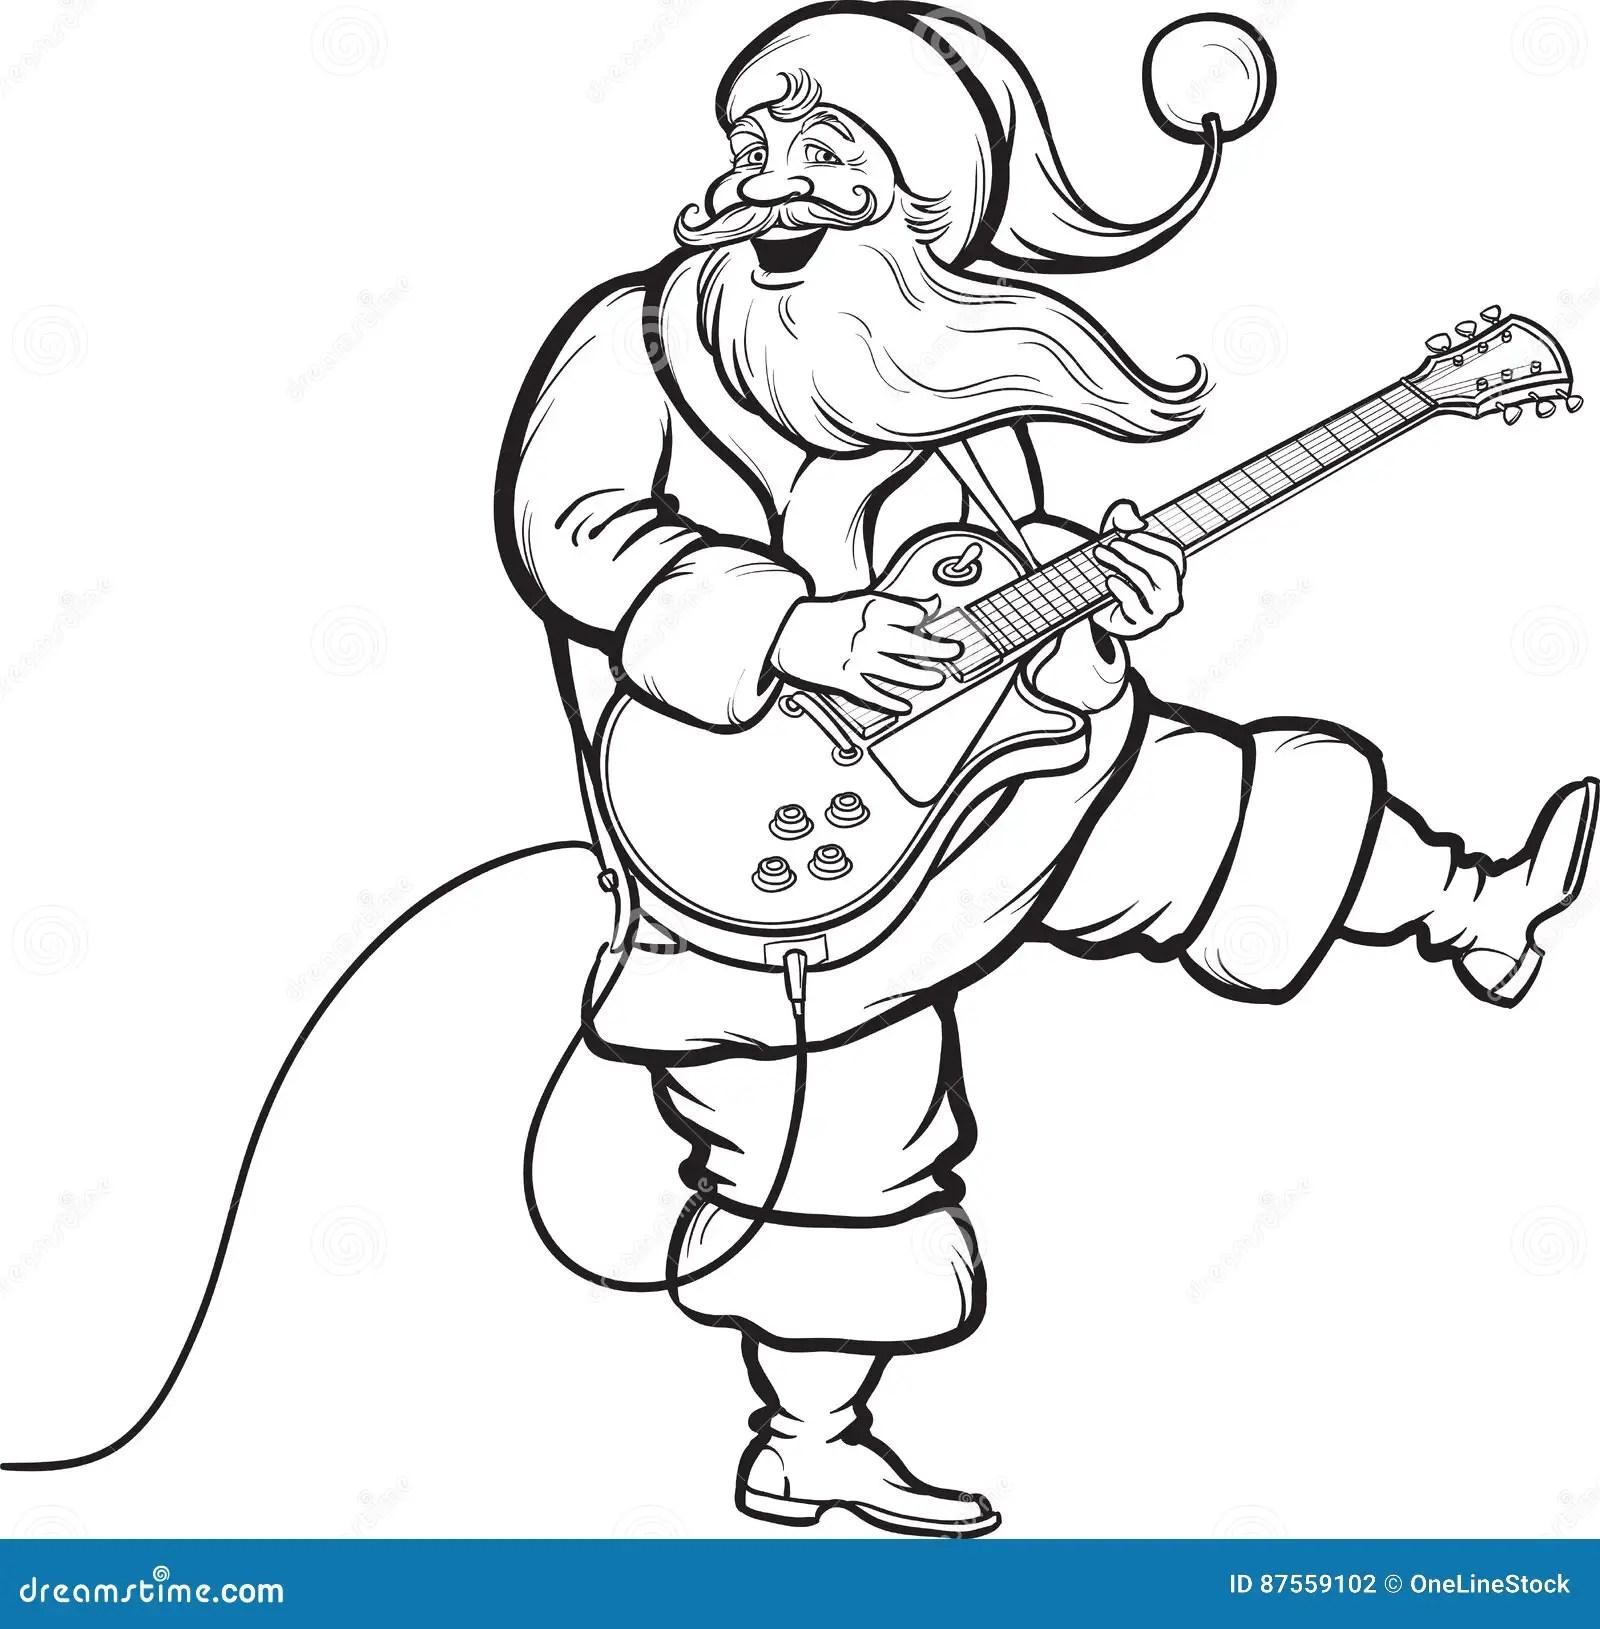 Coloring Book Of Santa Playing Electric Guitar Stock